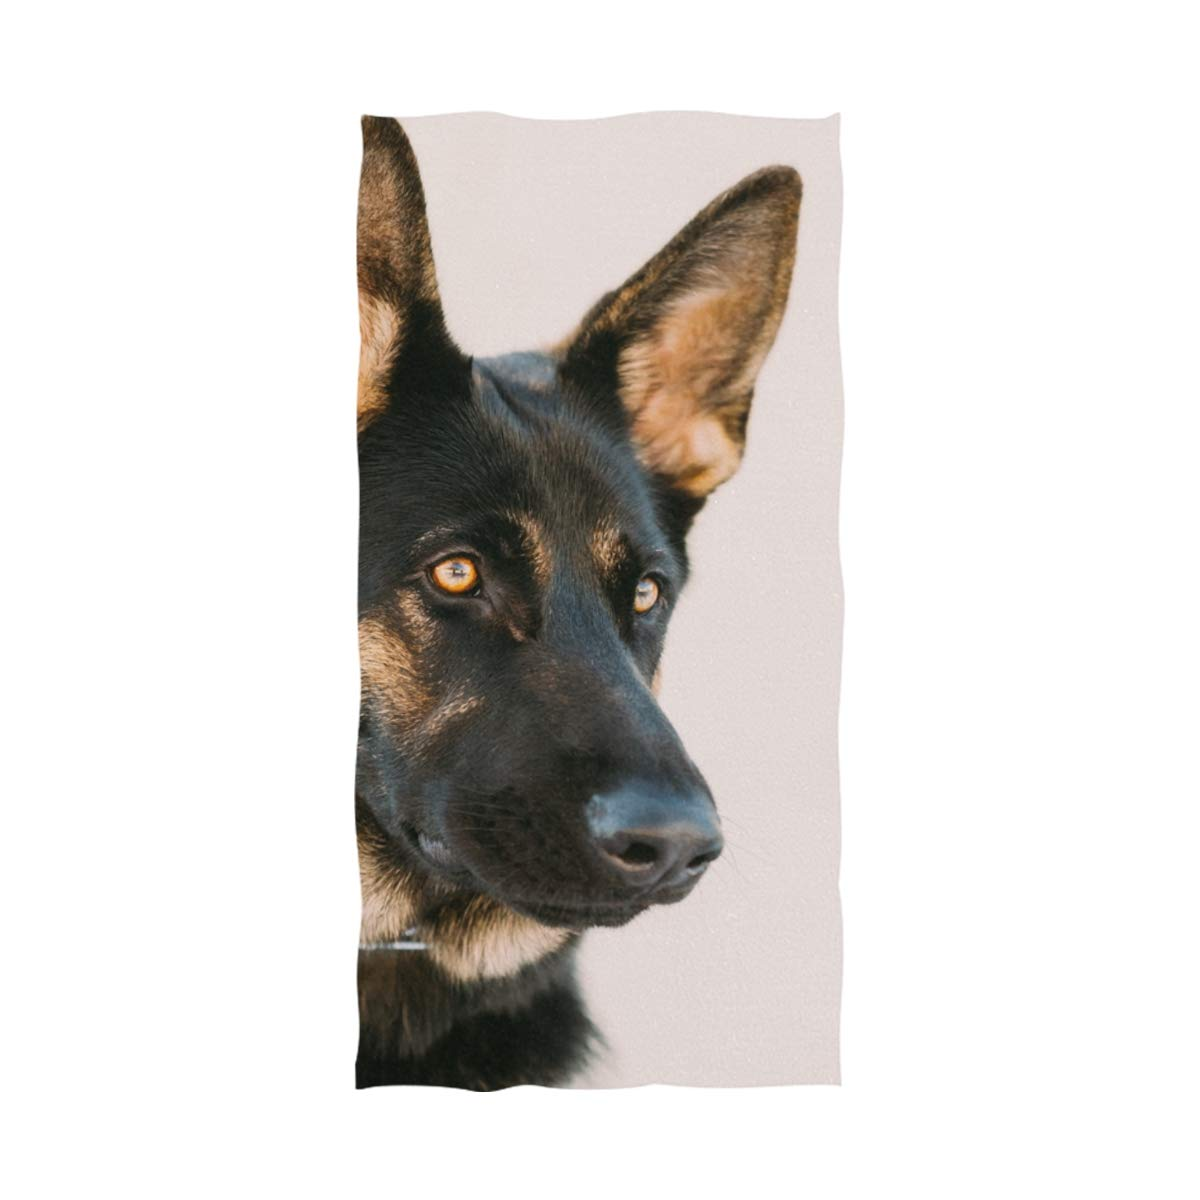 La Random German Shepherd Dog Print Soft Absorbent Bath Towels Spa Bench Bathroom Towels for Adults Kids 64 x 32 inch